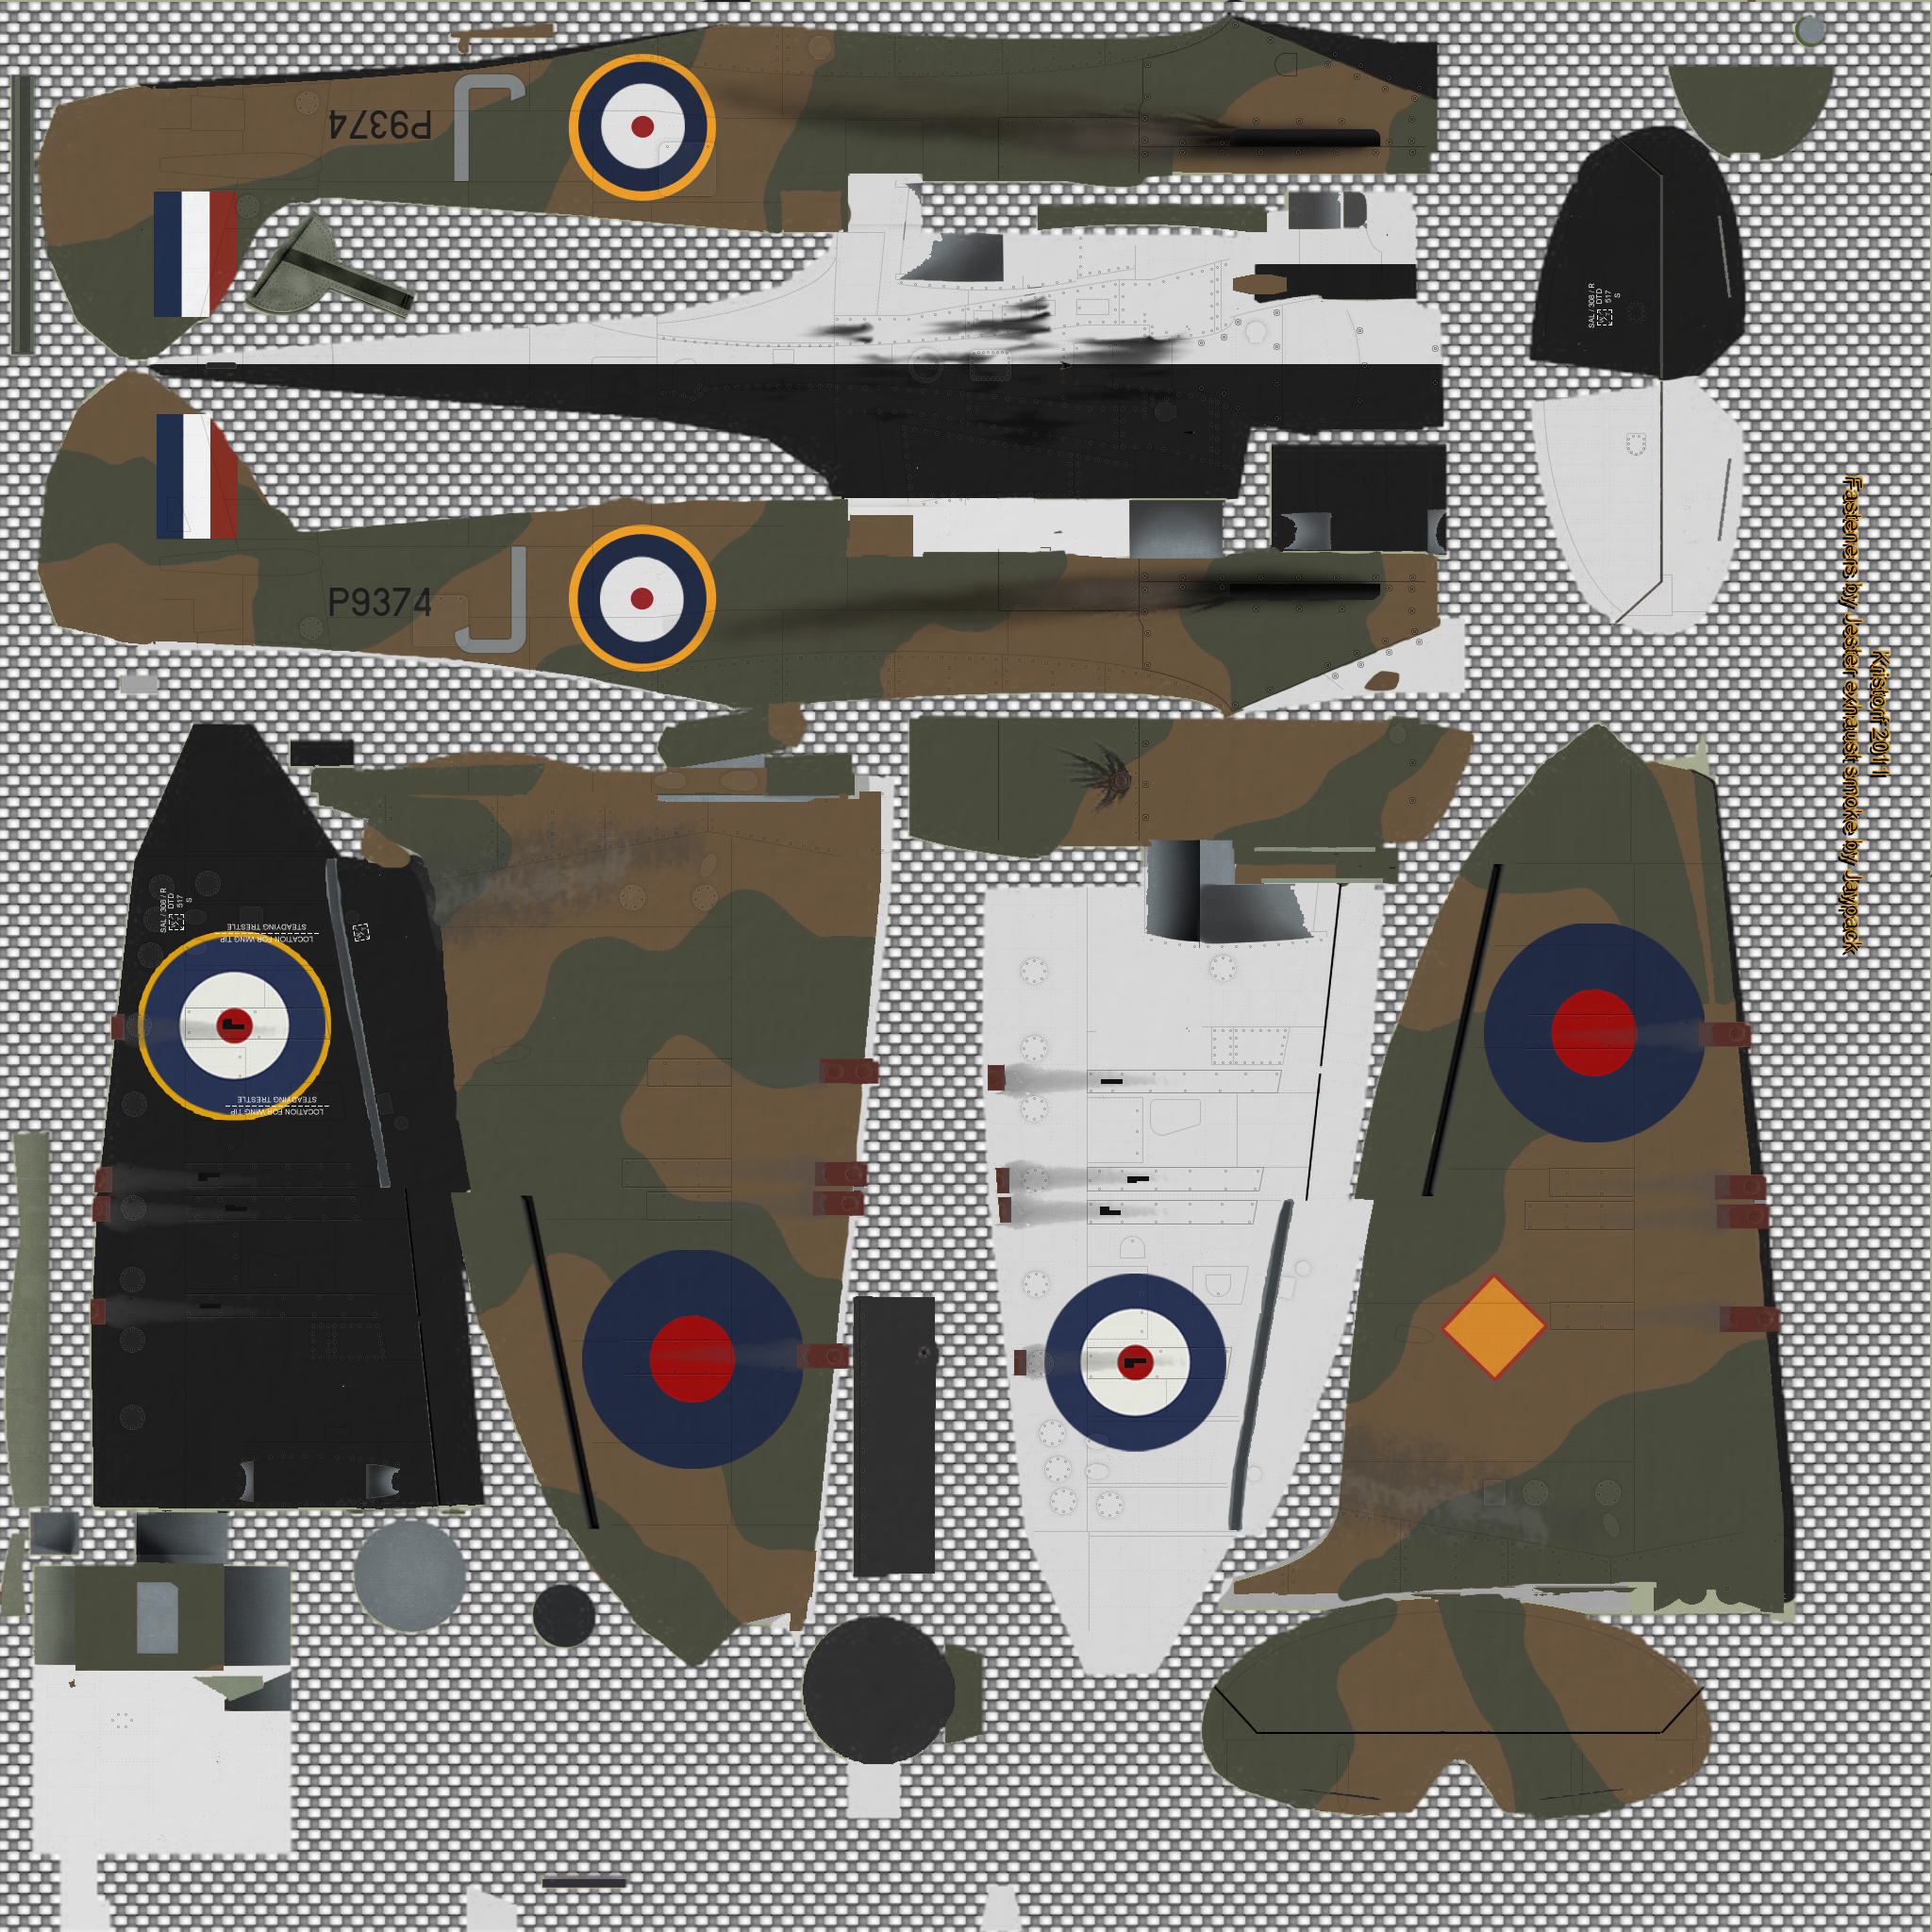 COD KF MkIa RAF 92Sqn GRJ P9374 France May 1940